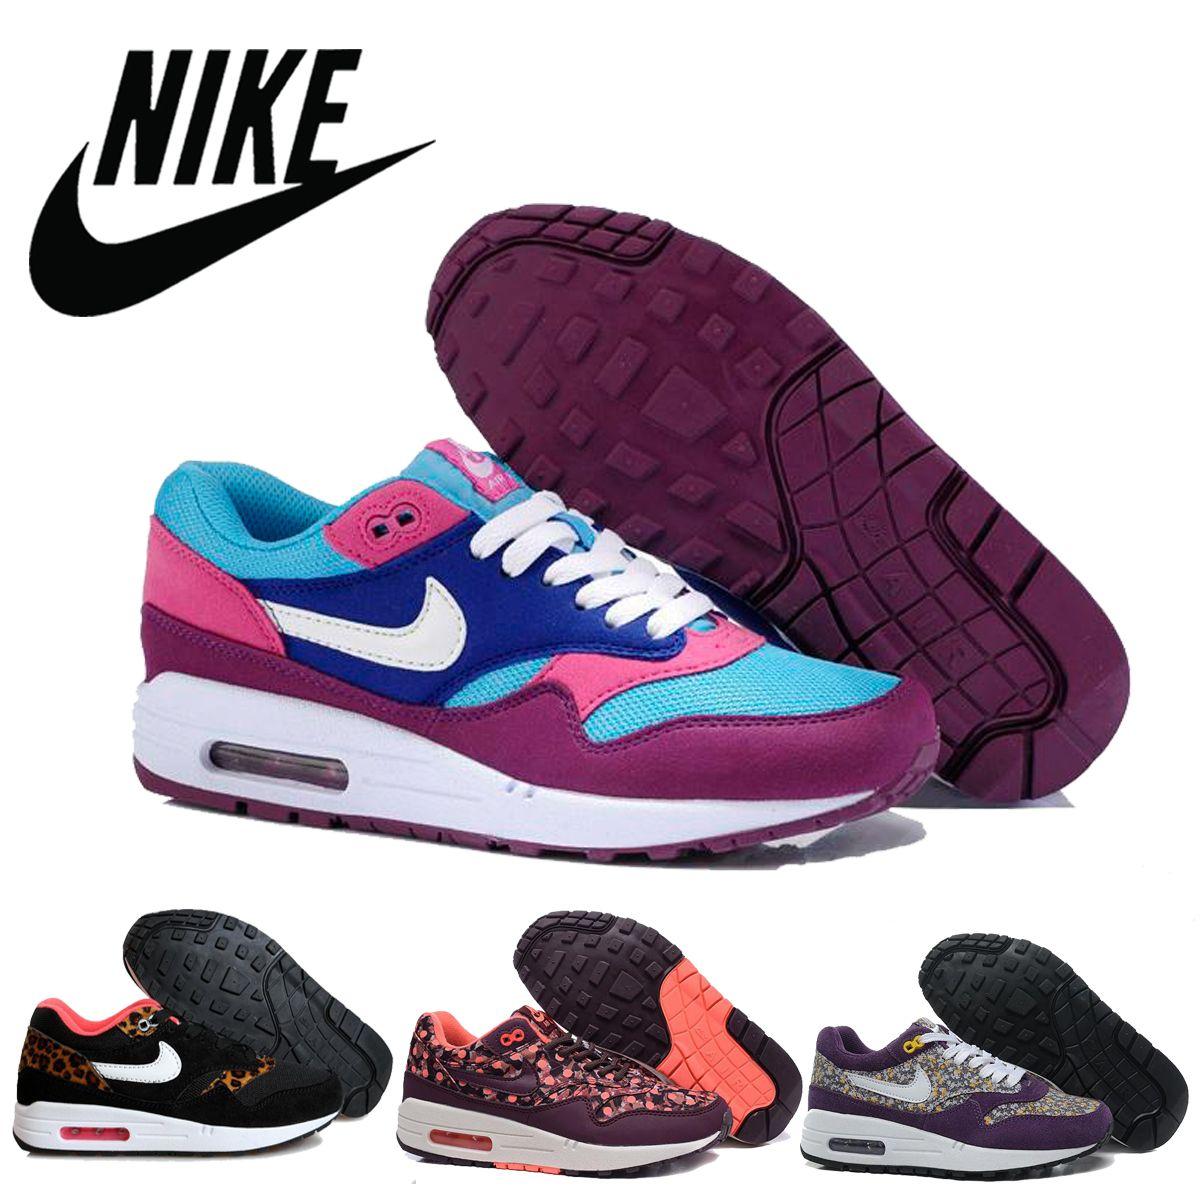 online retailer 0d277 3babf official store nike lunarglide leopard pink discharge 262b2 2c0bd